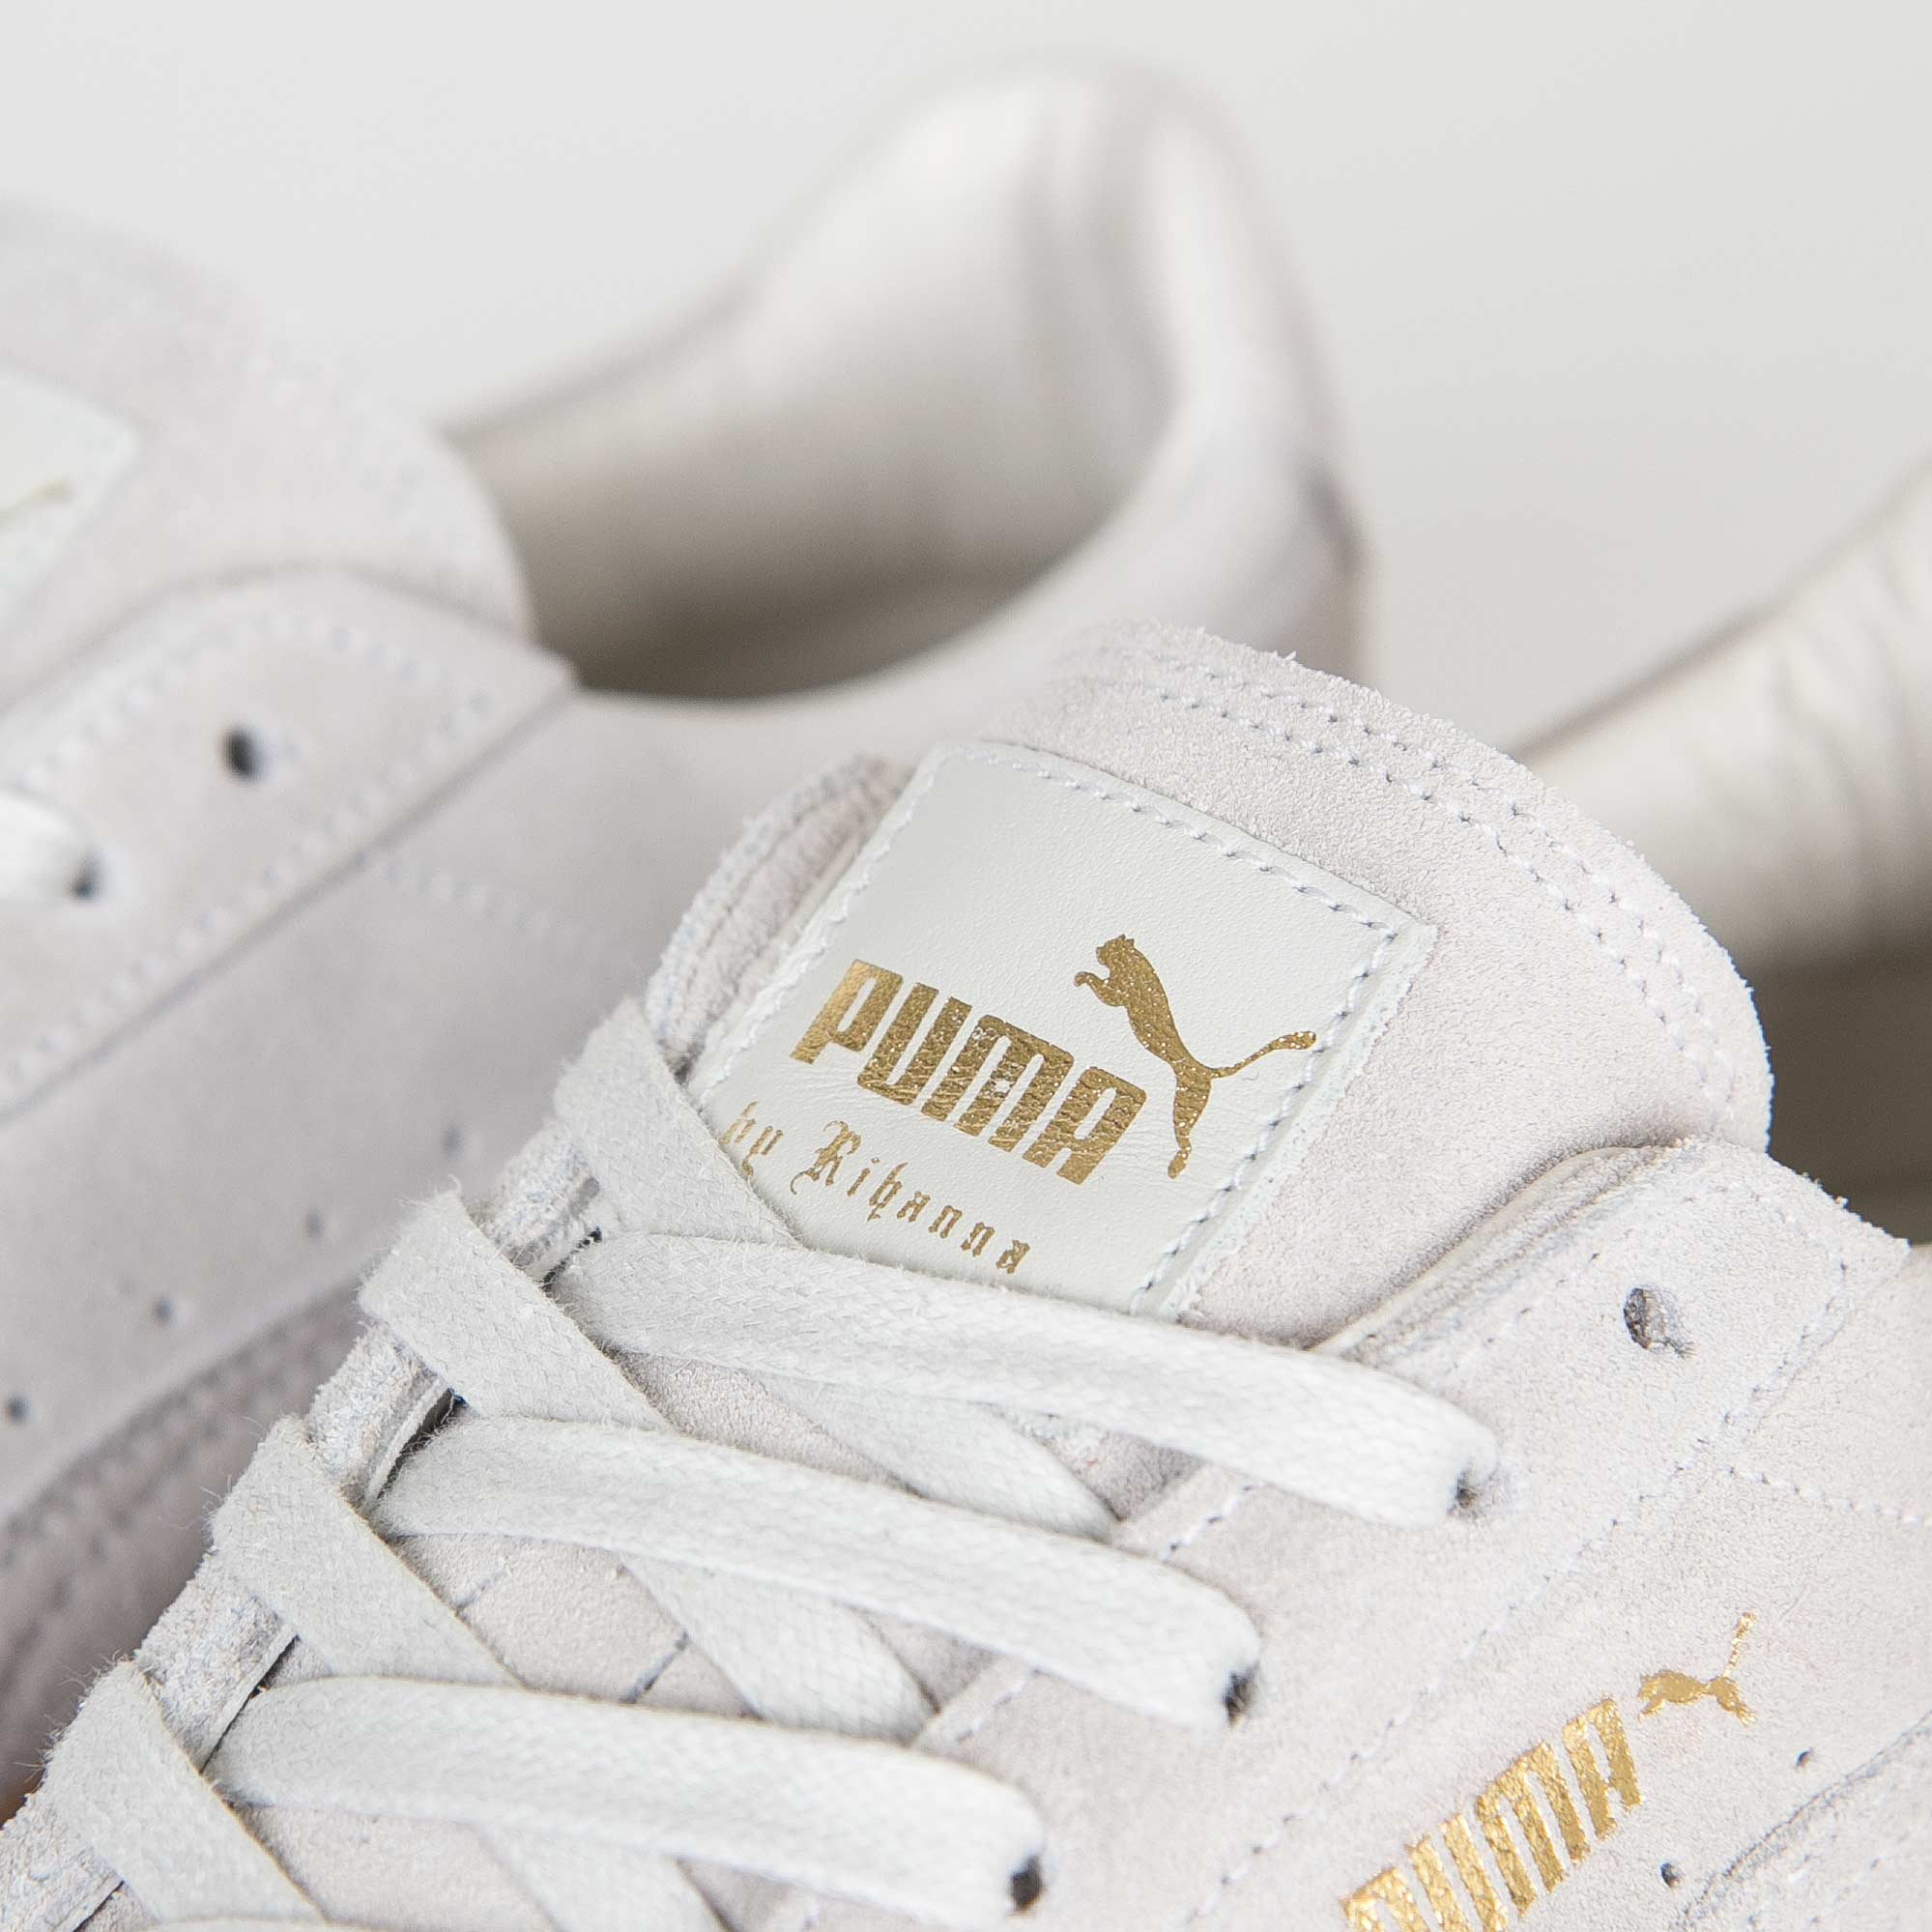 Puma Suede Creepers White